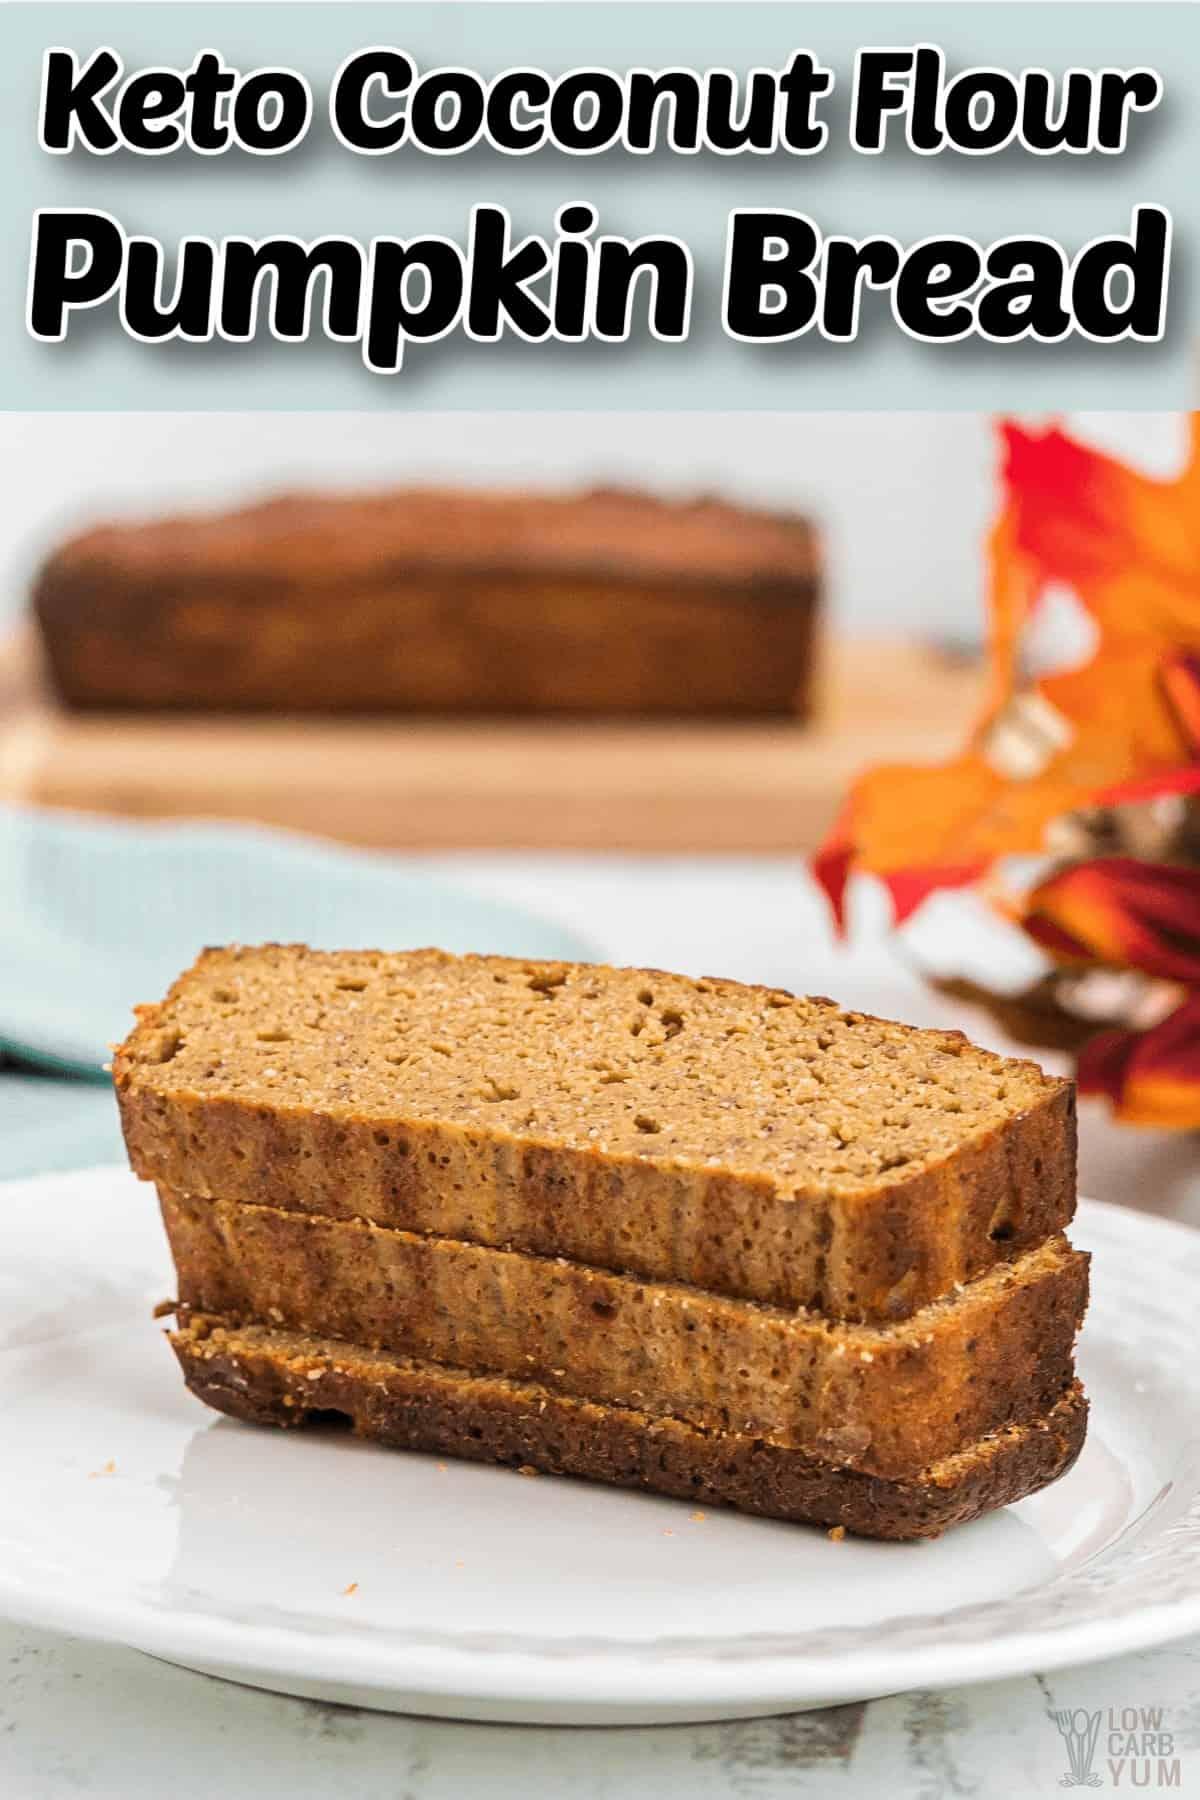 keto coconut flour pumpkin bread pintrest image